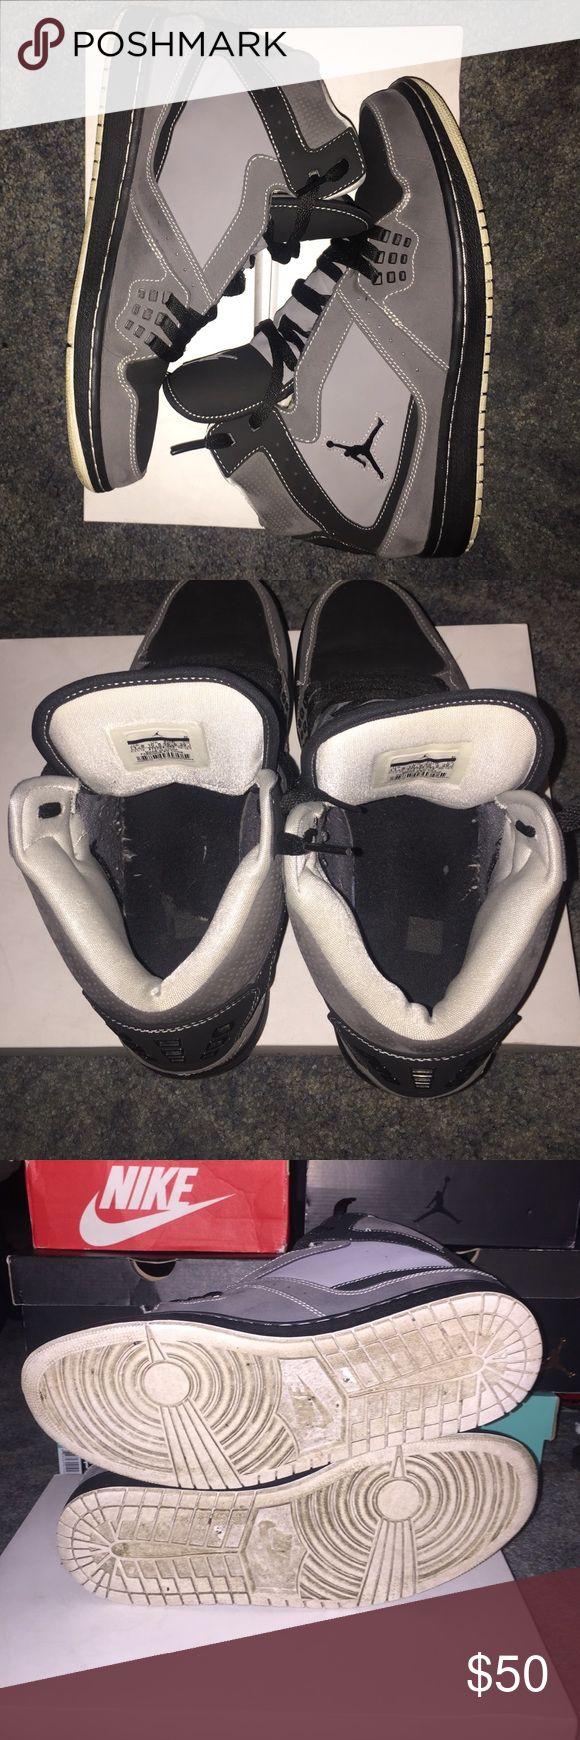 JORDAN 1 FLIGHT SIZE 11.5 JORDAN 1 FLIGHT                                                    RELEASE DATE 03/XX/2012 Jordan Shoes Athletic Shoes